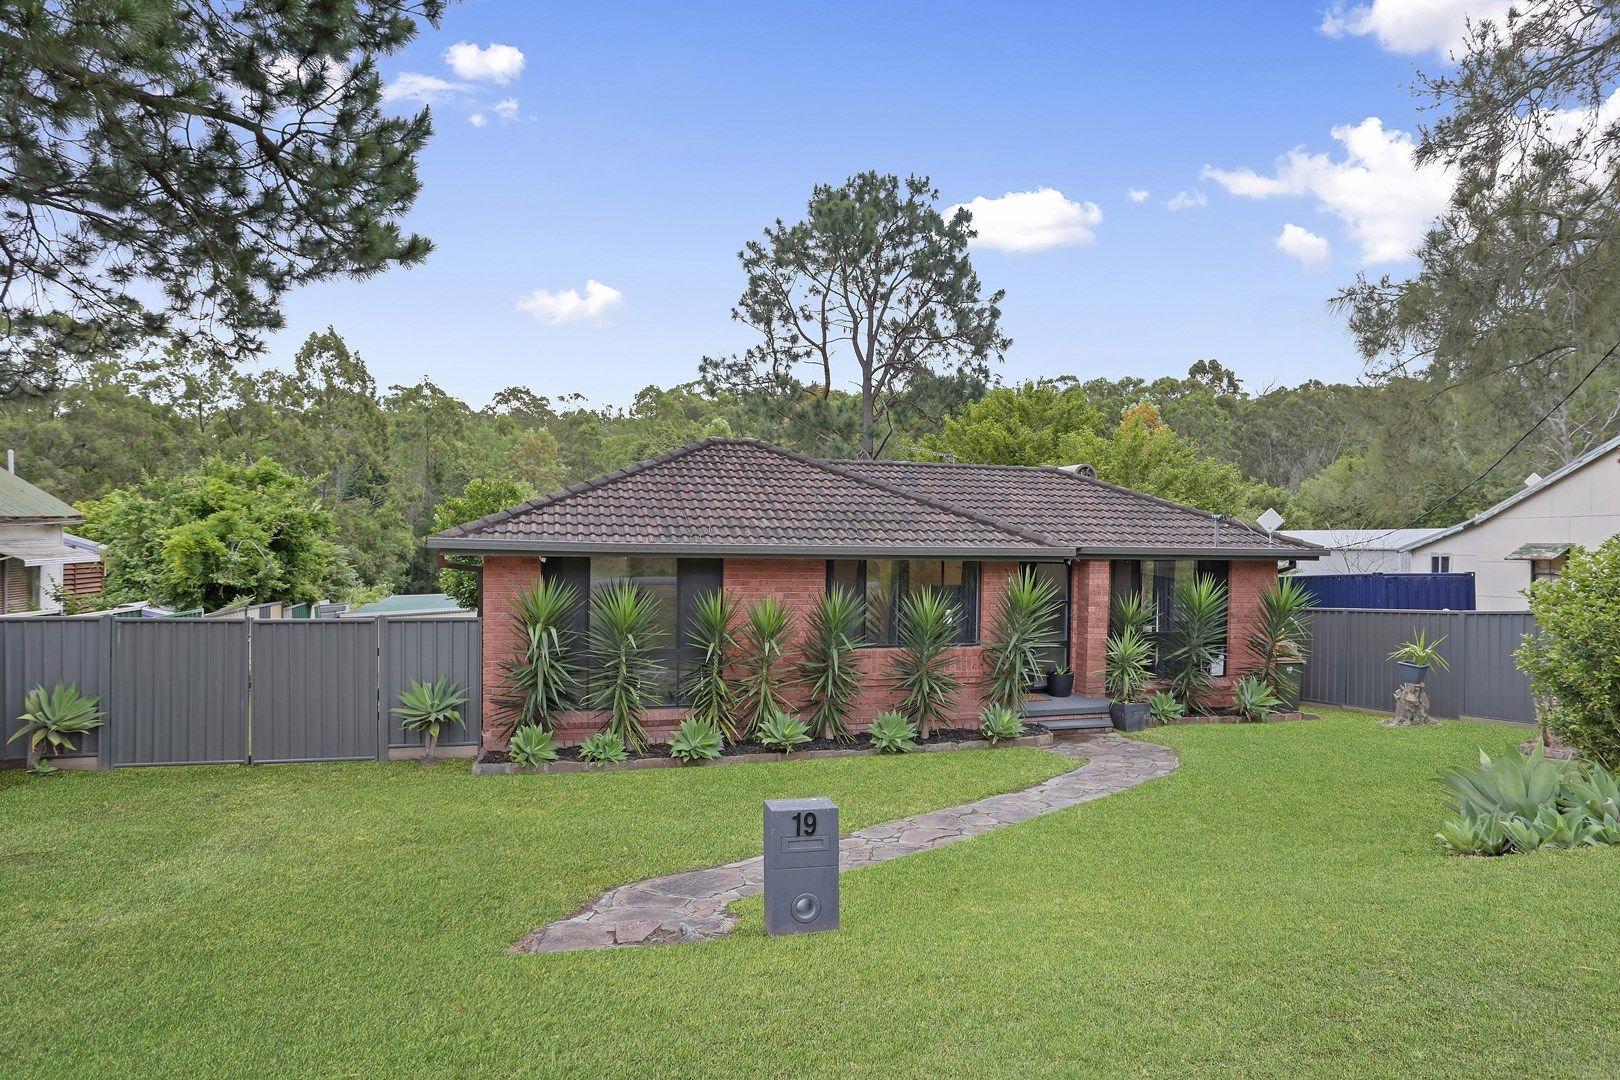 19 Station Street, Martins Creek NSW 2420, Image 0